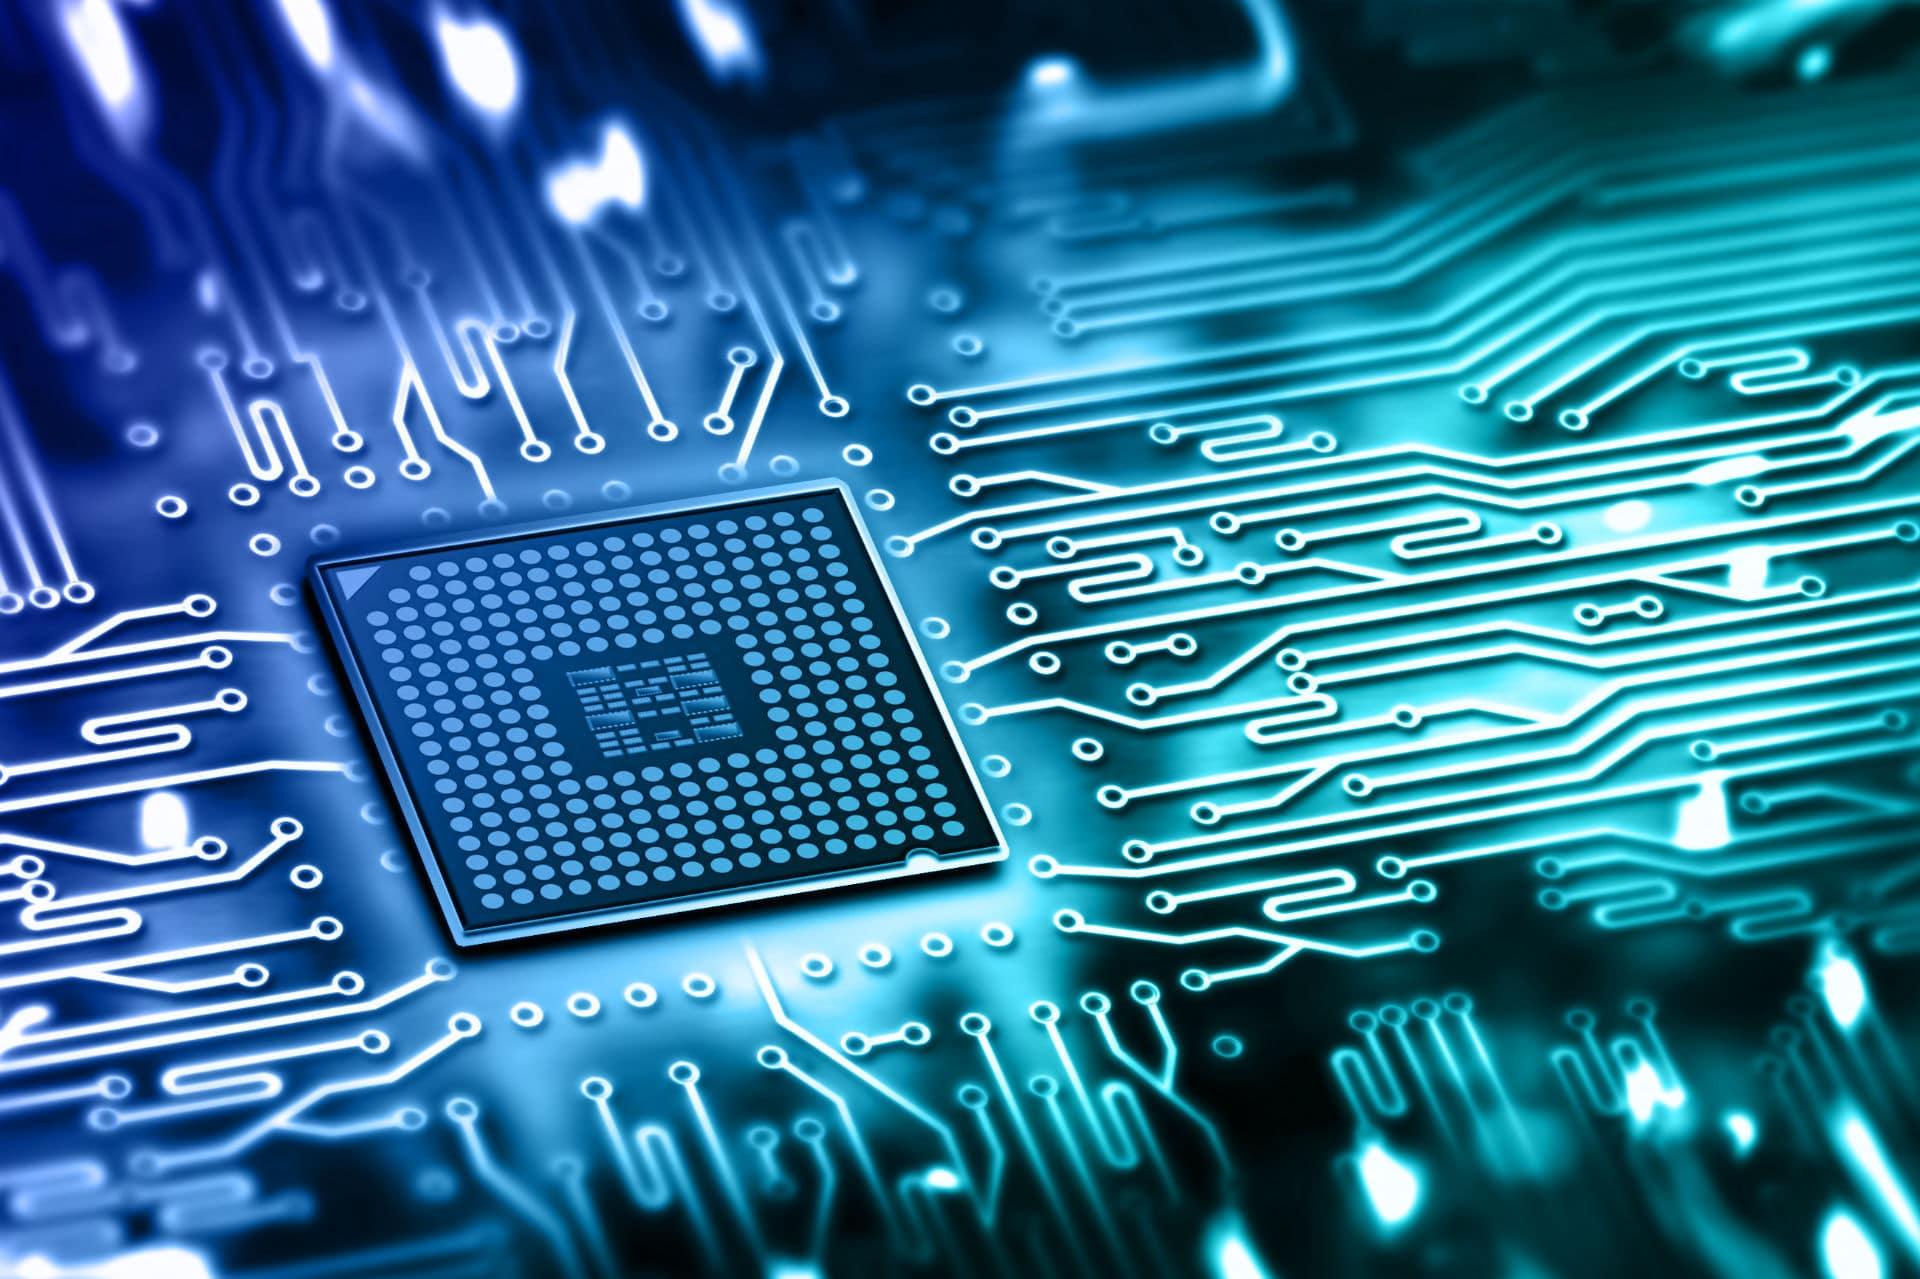 eVision Systems GmbH - Hardware development